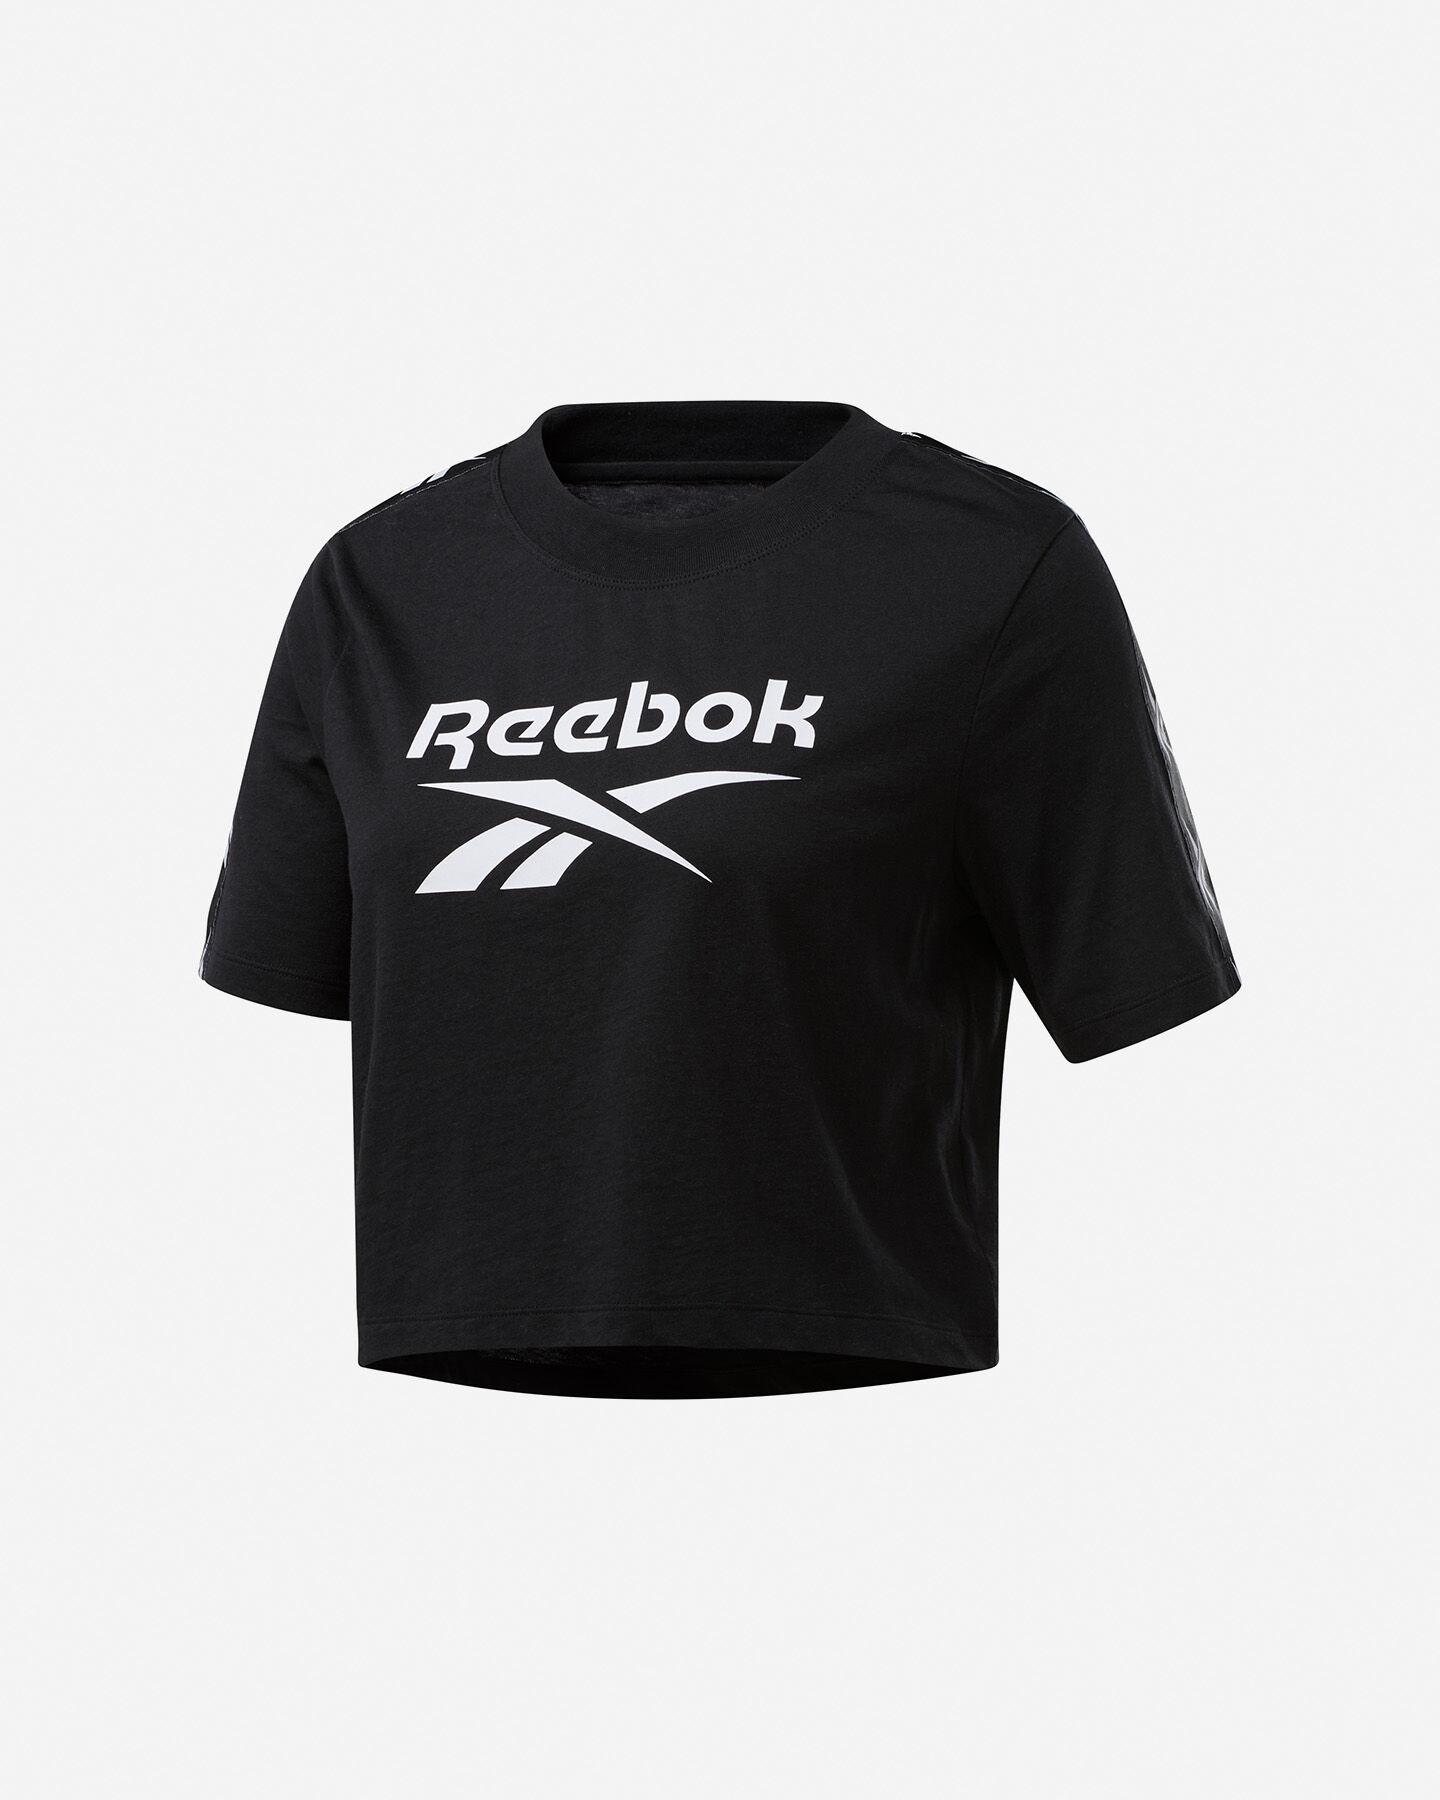 T-Shirt REEBOK TAPE LOGO W S5258650 scatto 0